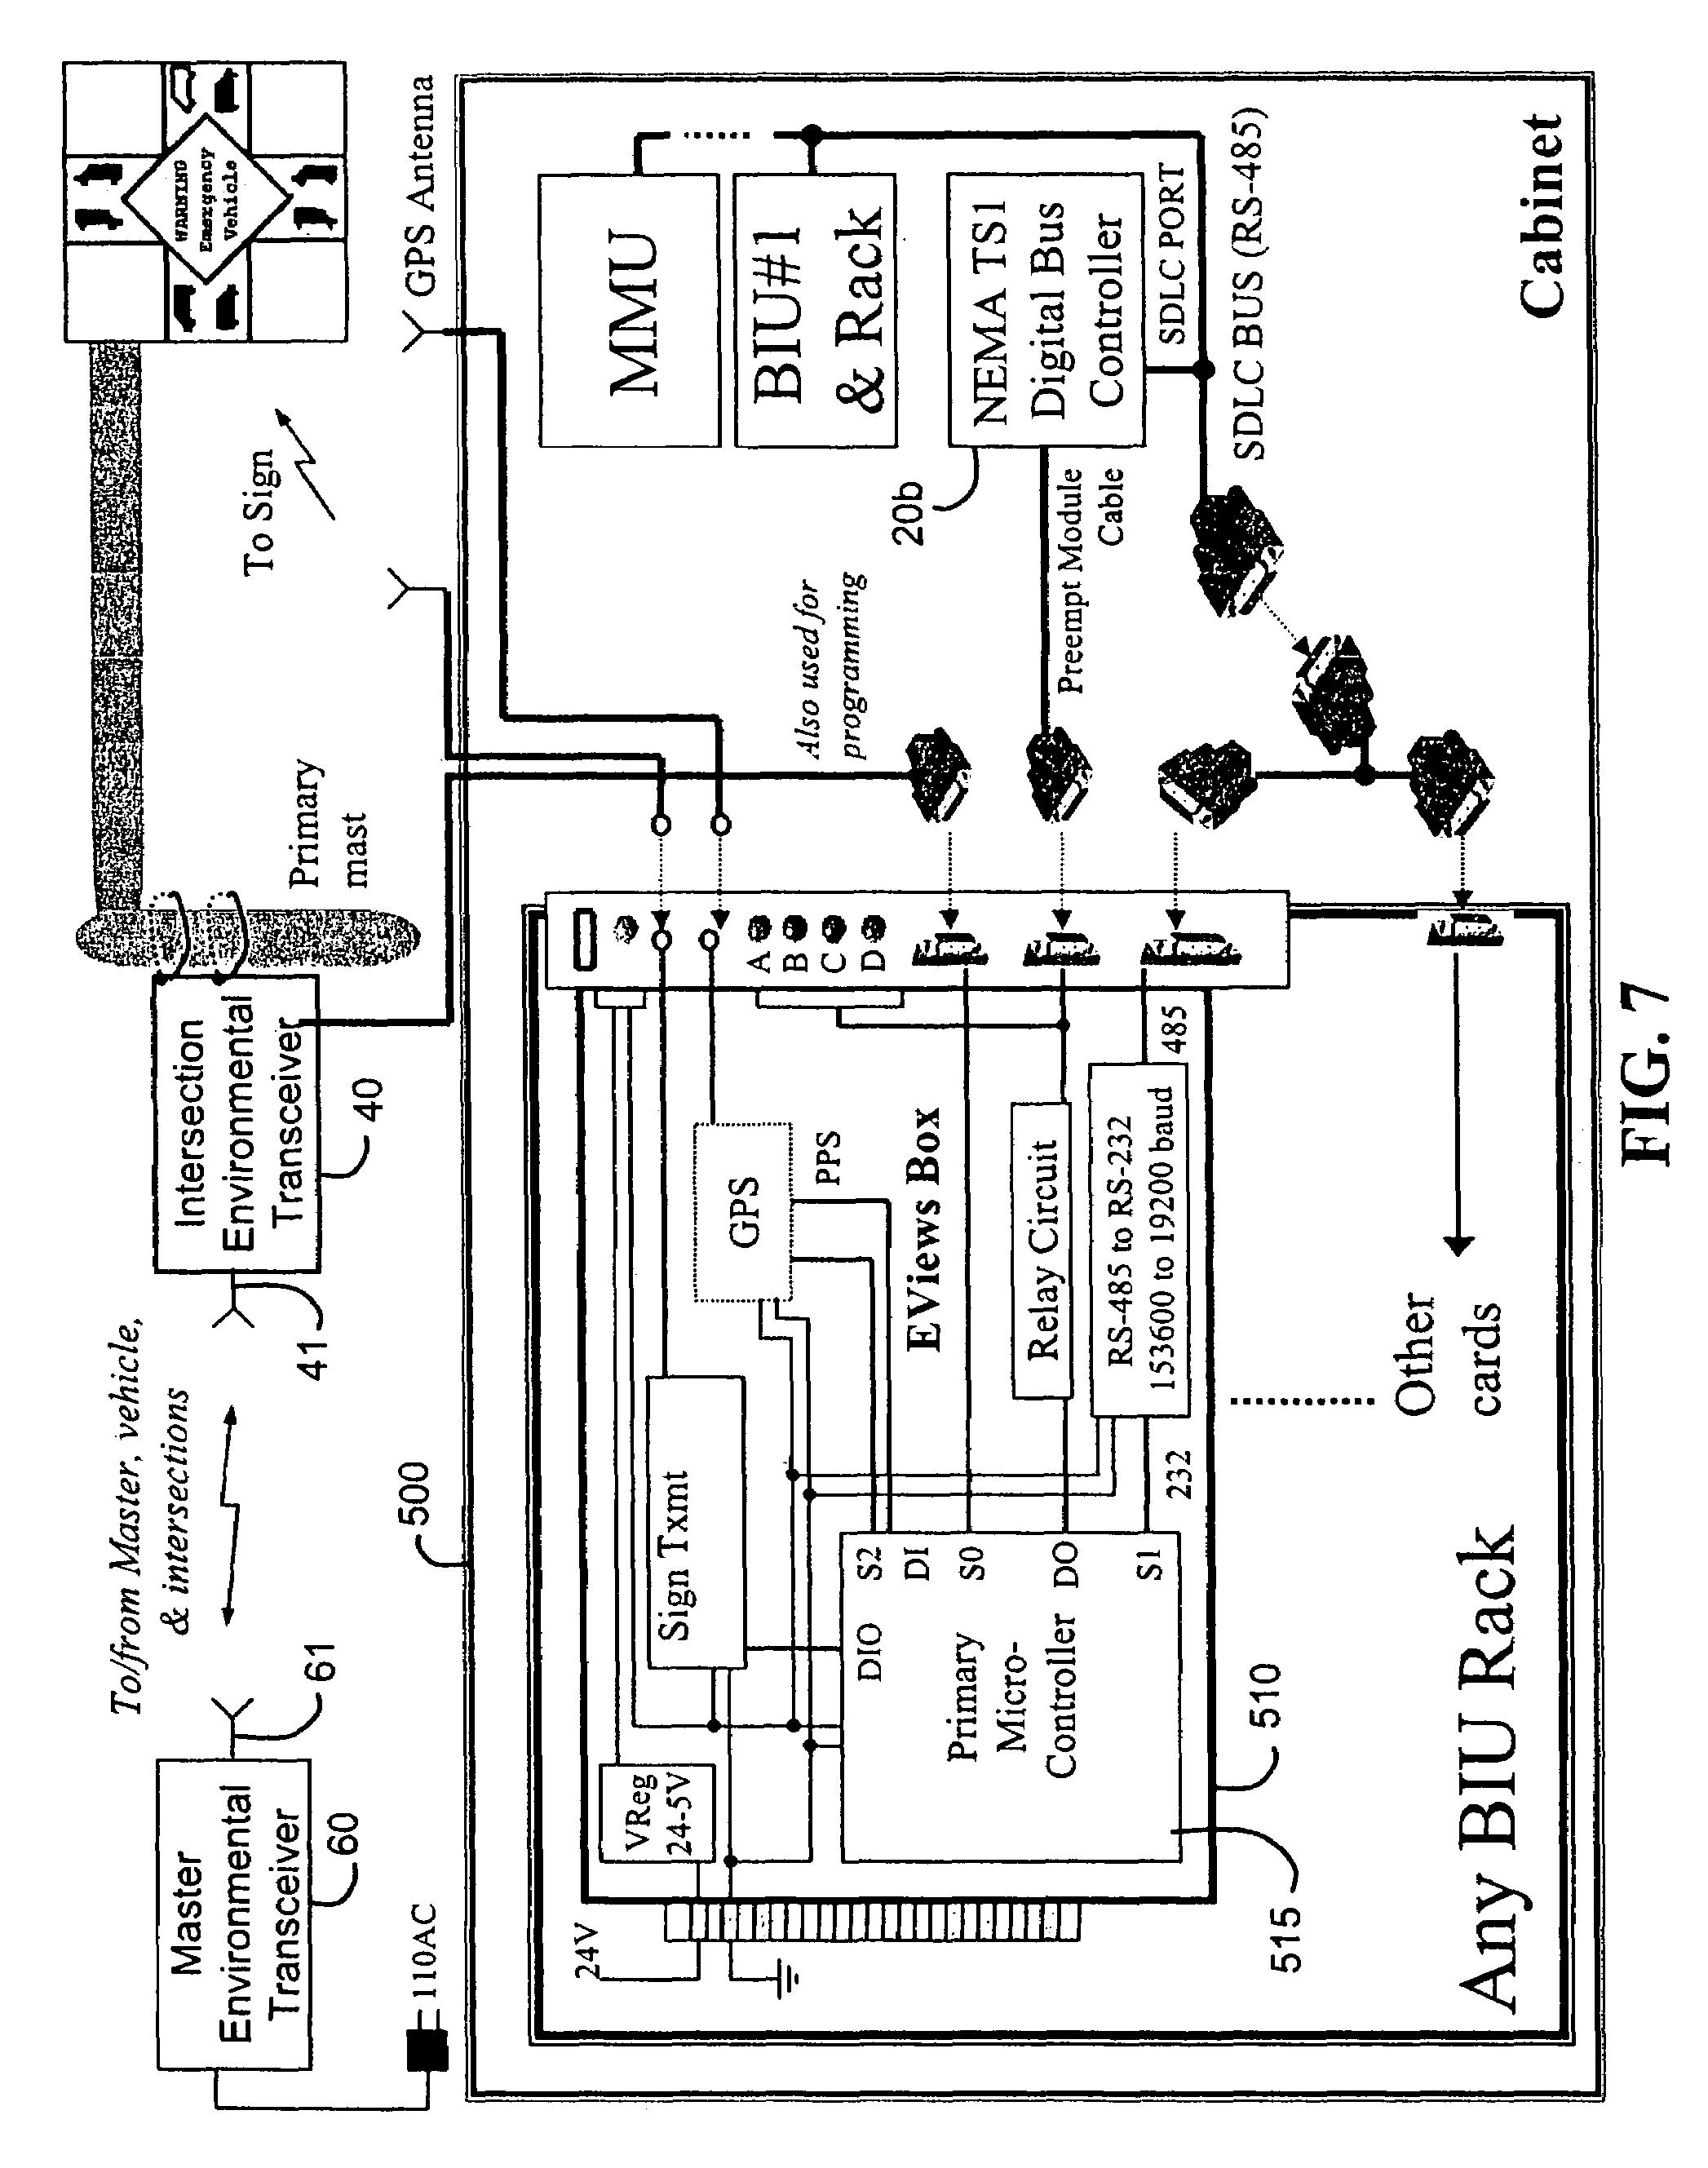 patent us7327280 - emergency vehicle traffic signal preemption system